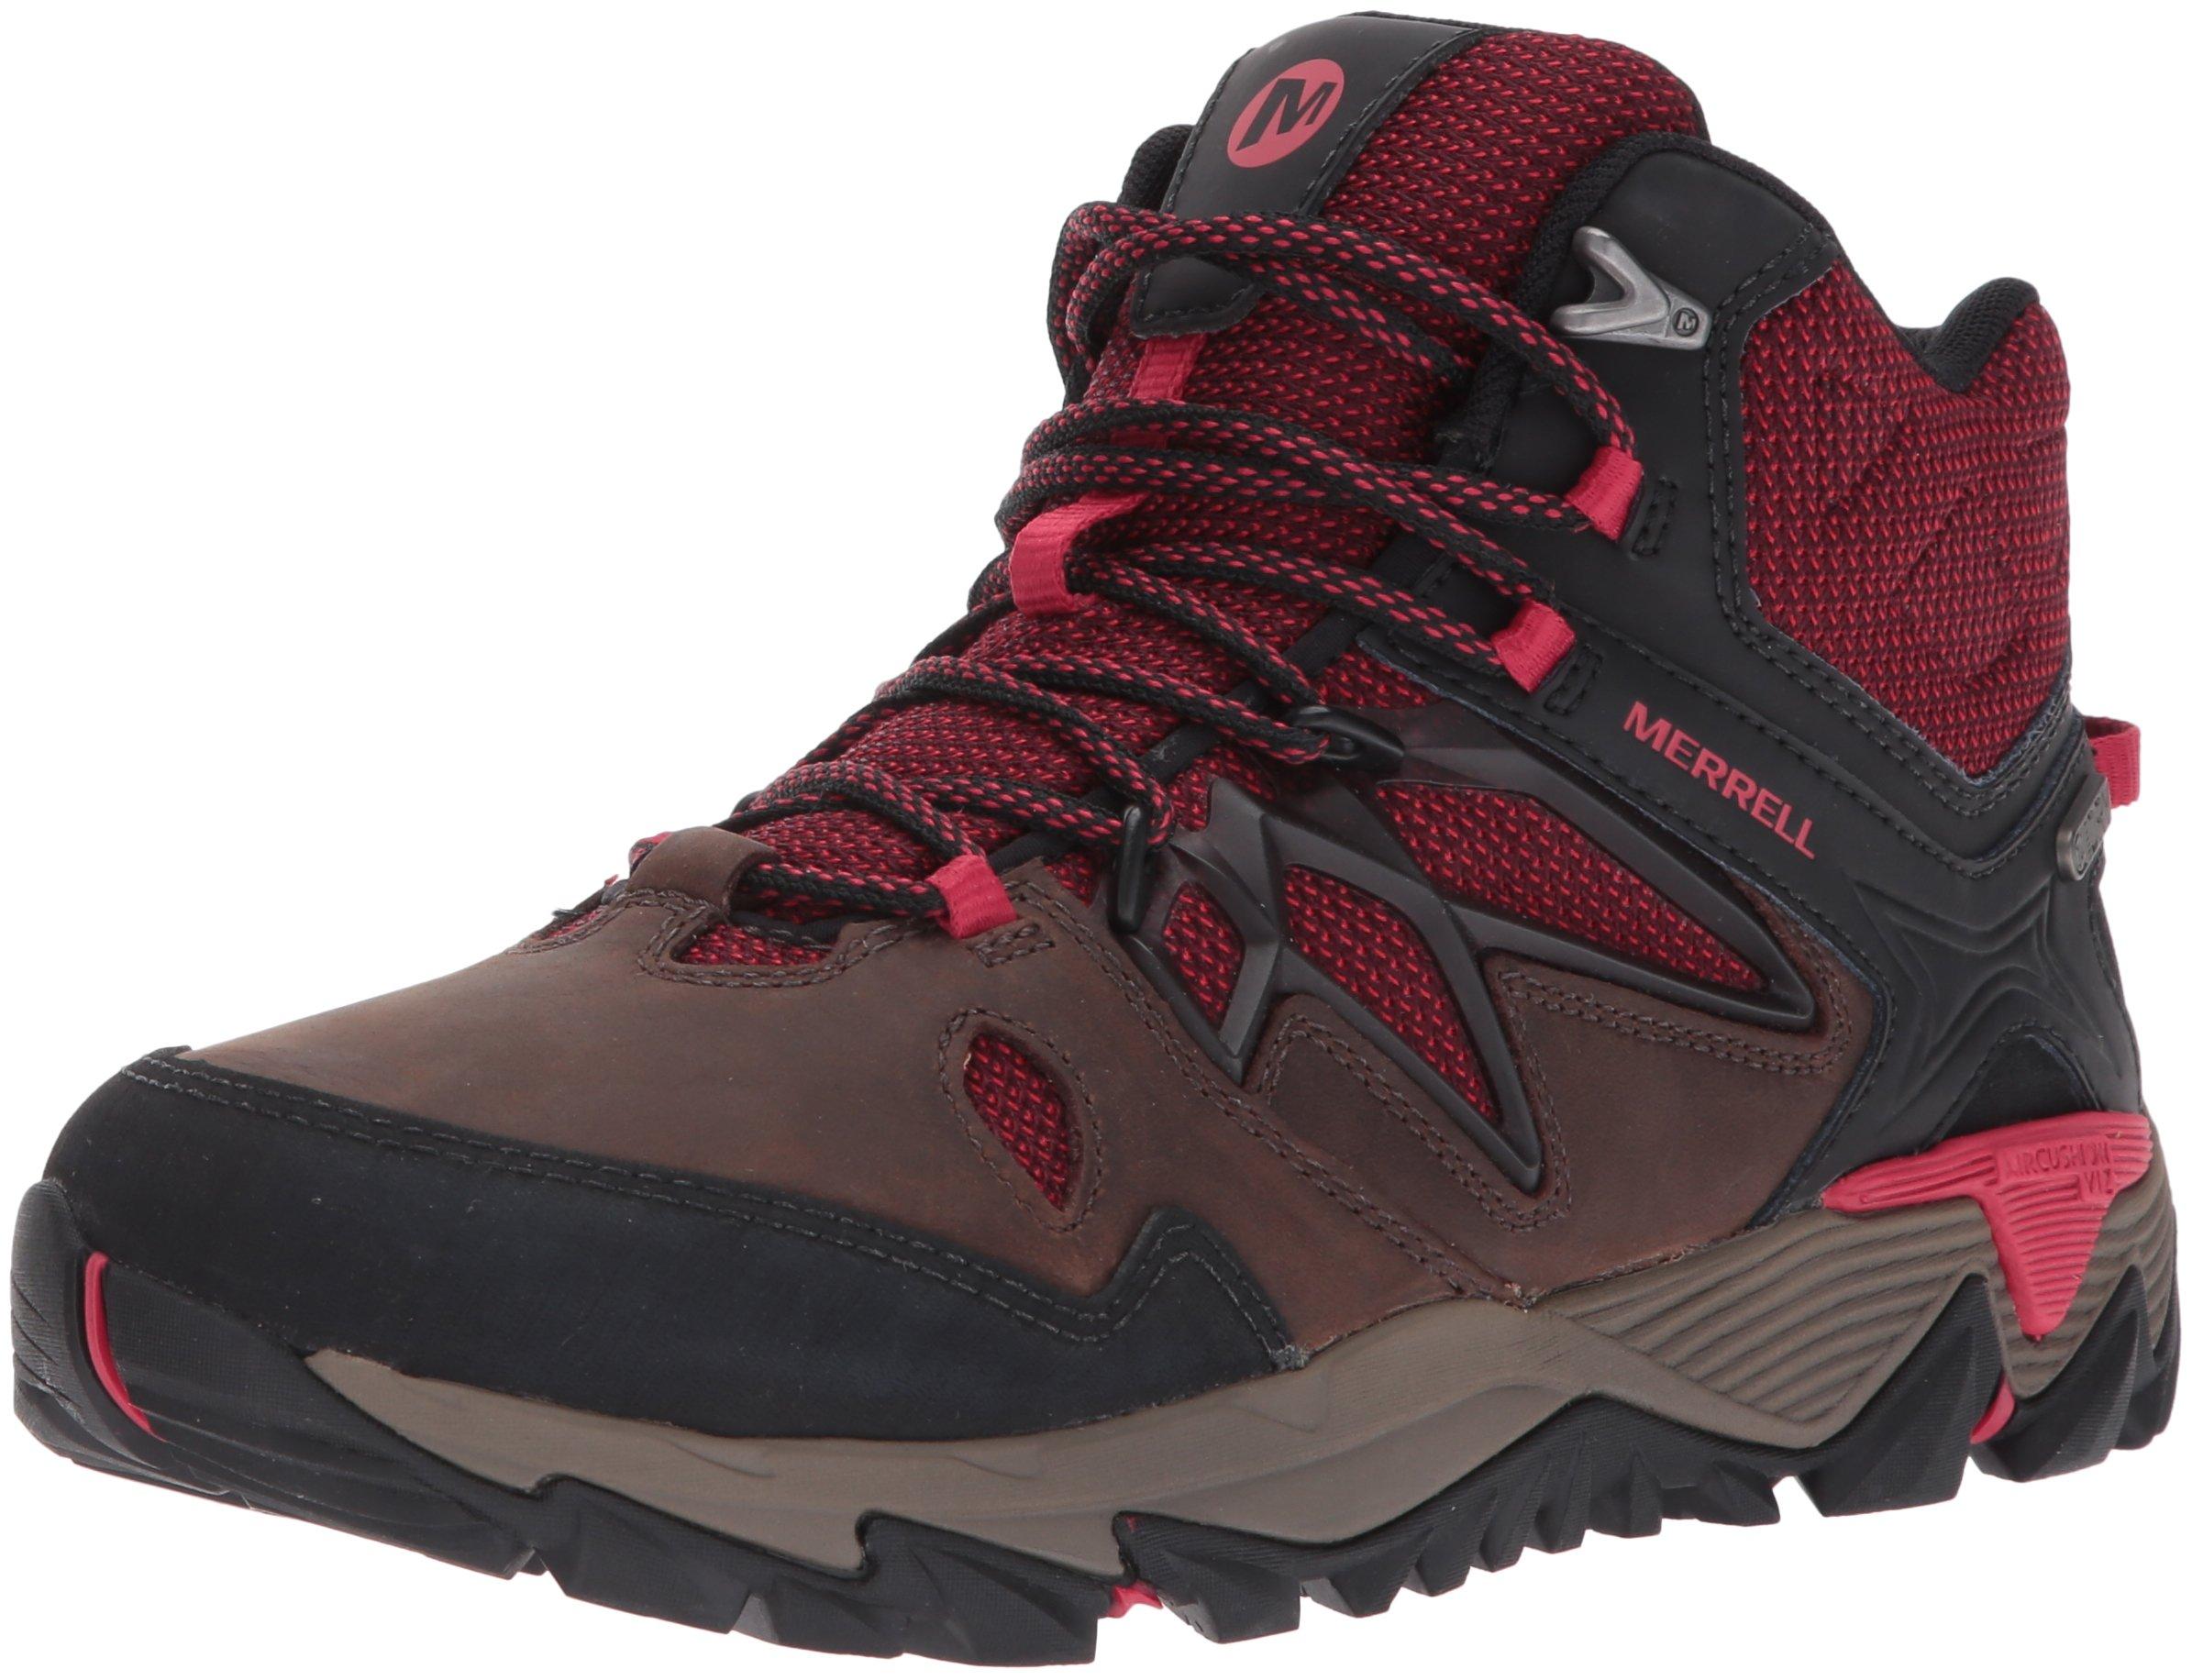 Merrell Women's All Out Blaze 2 Mid Waterproof Hiking Boot